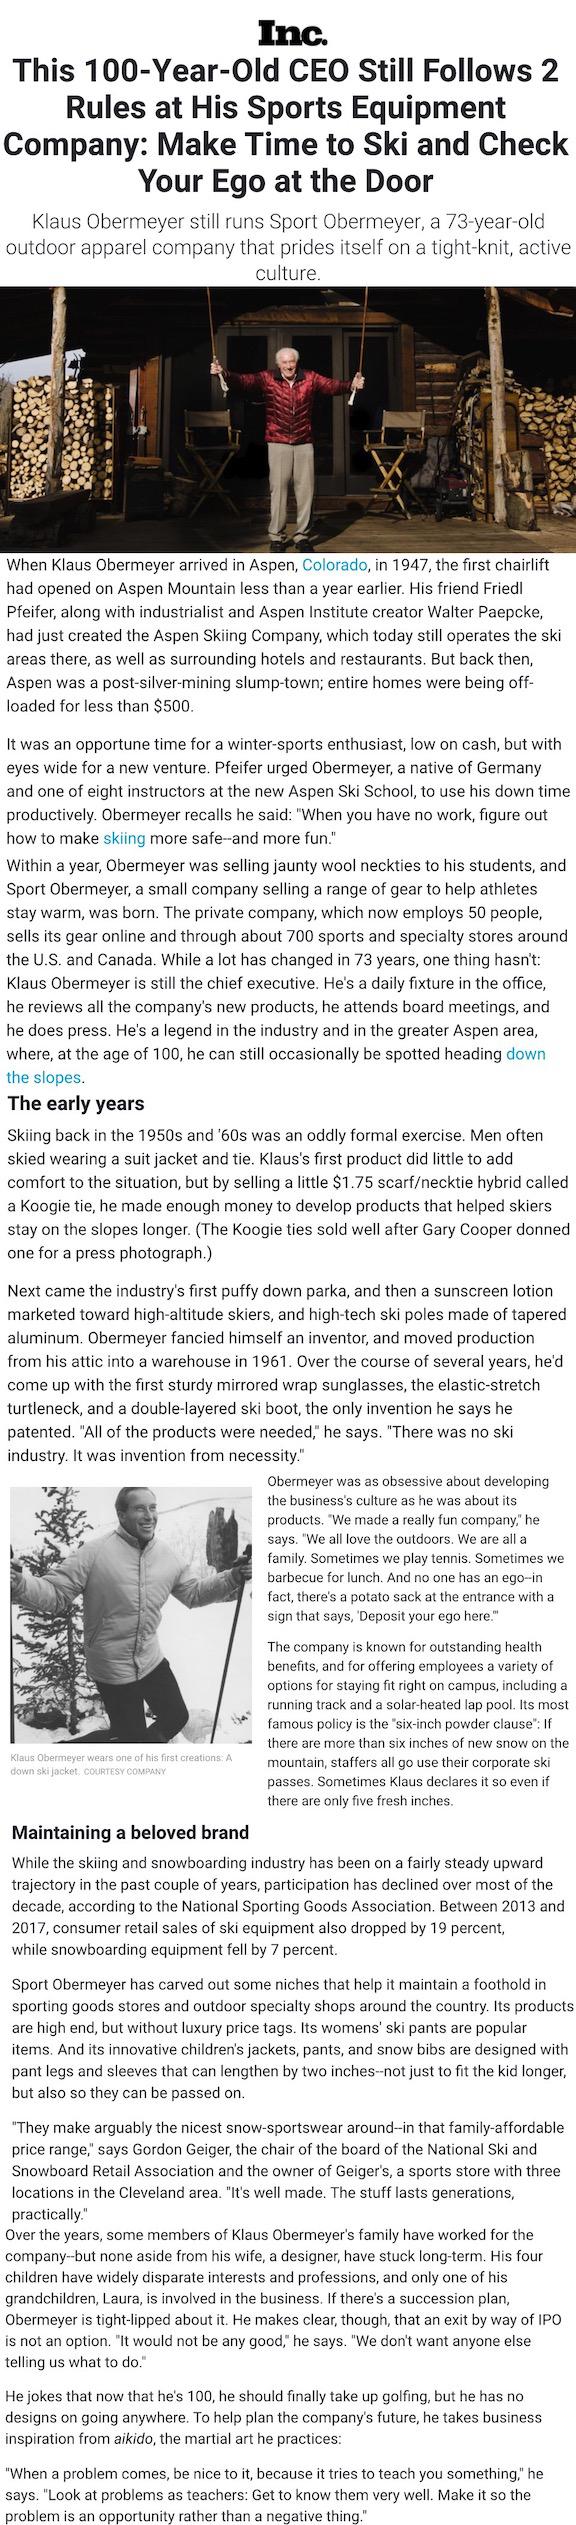 Inc Magazine Klaus Obermeyer story